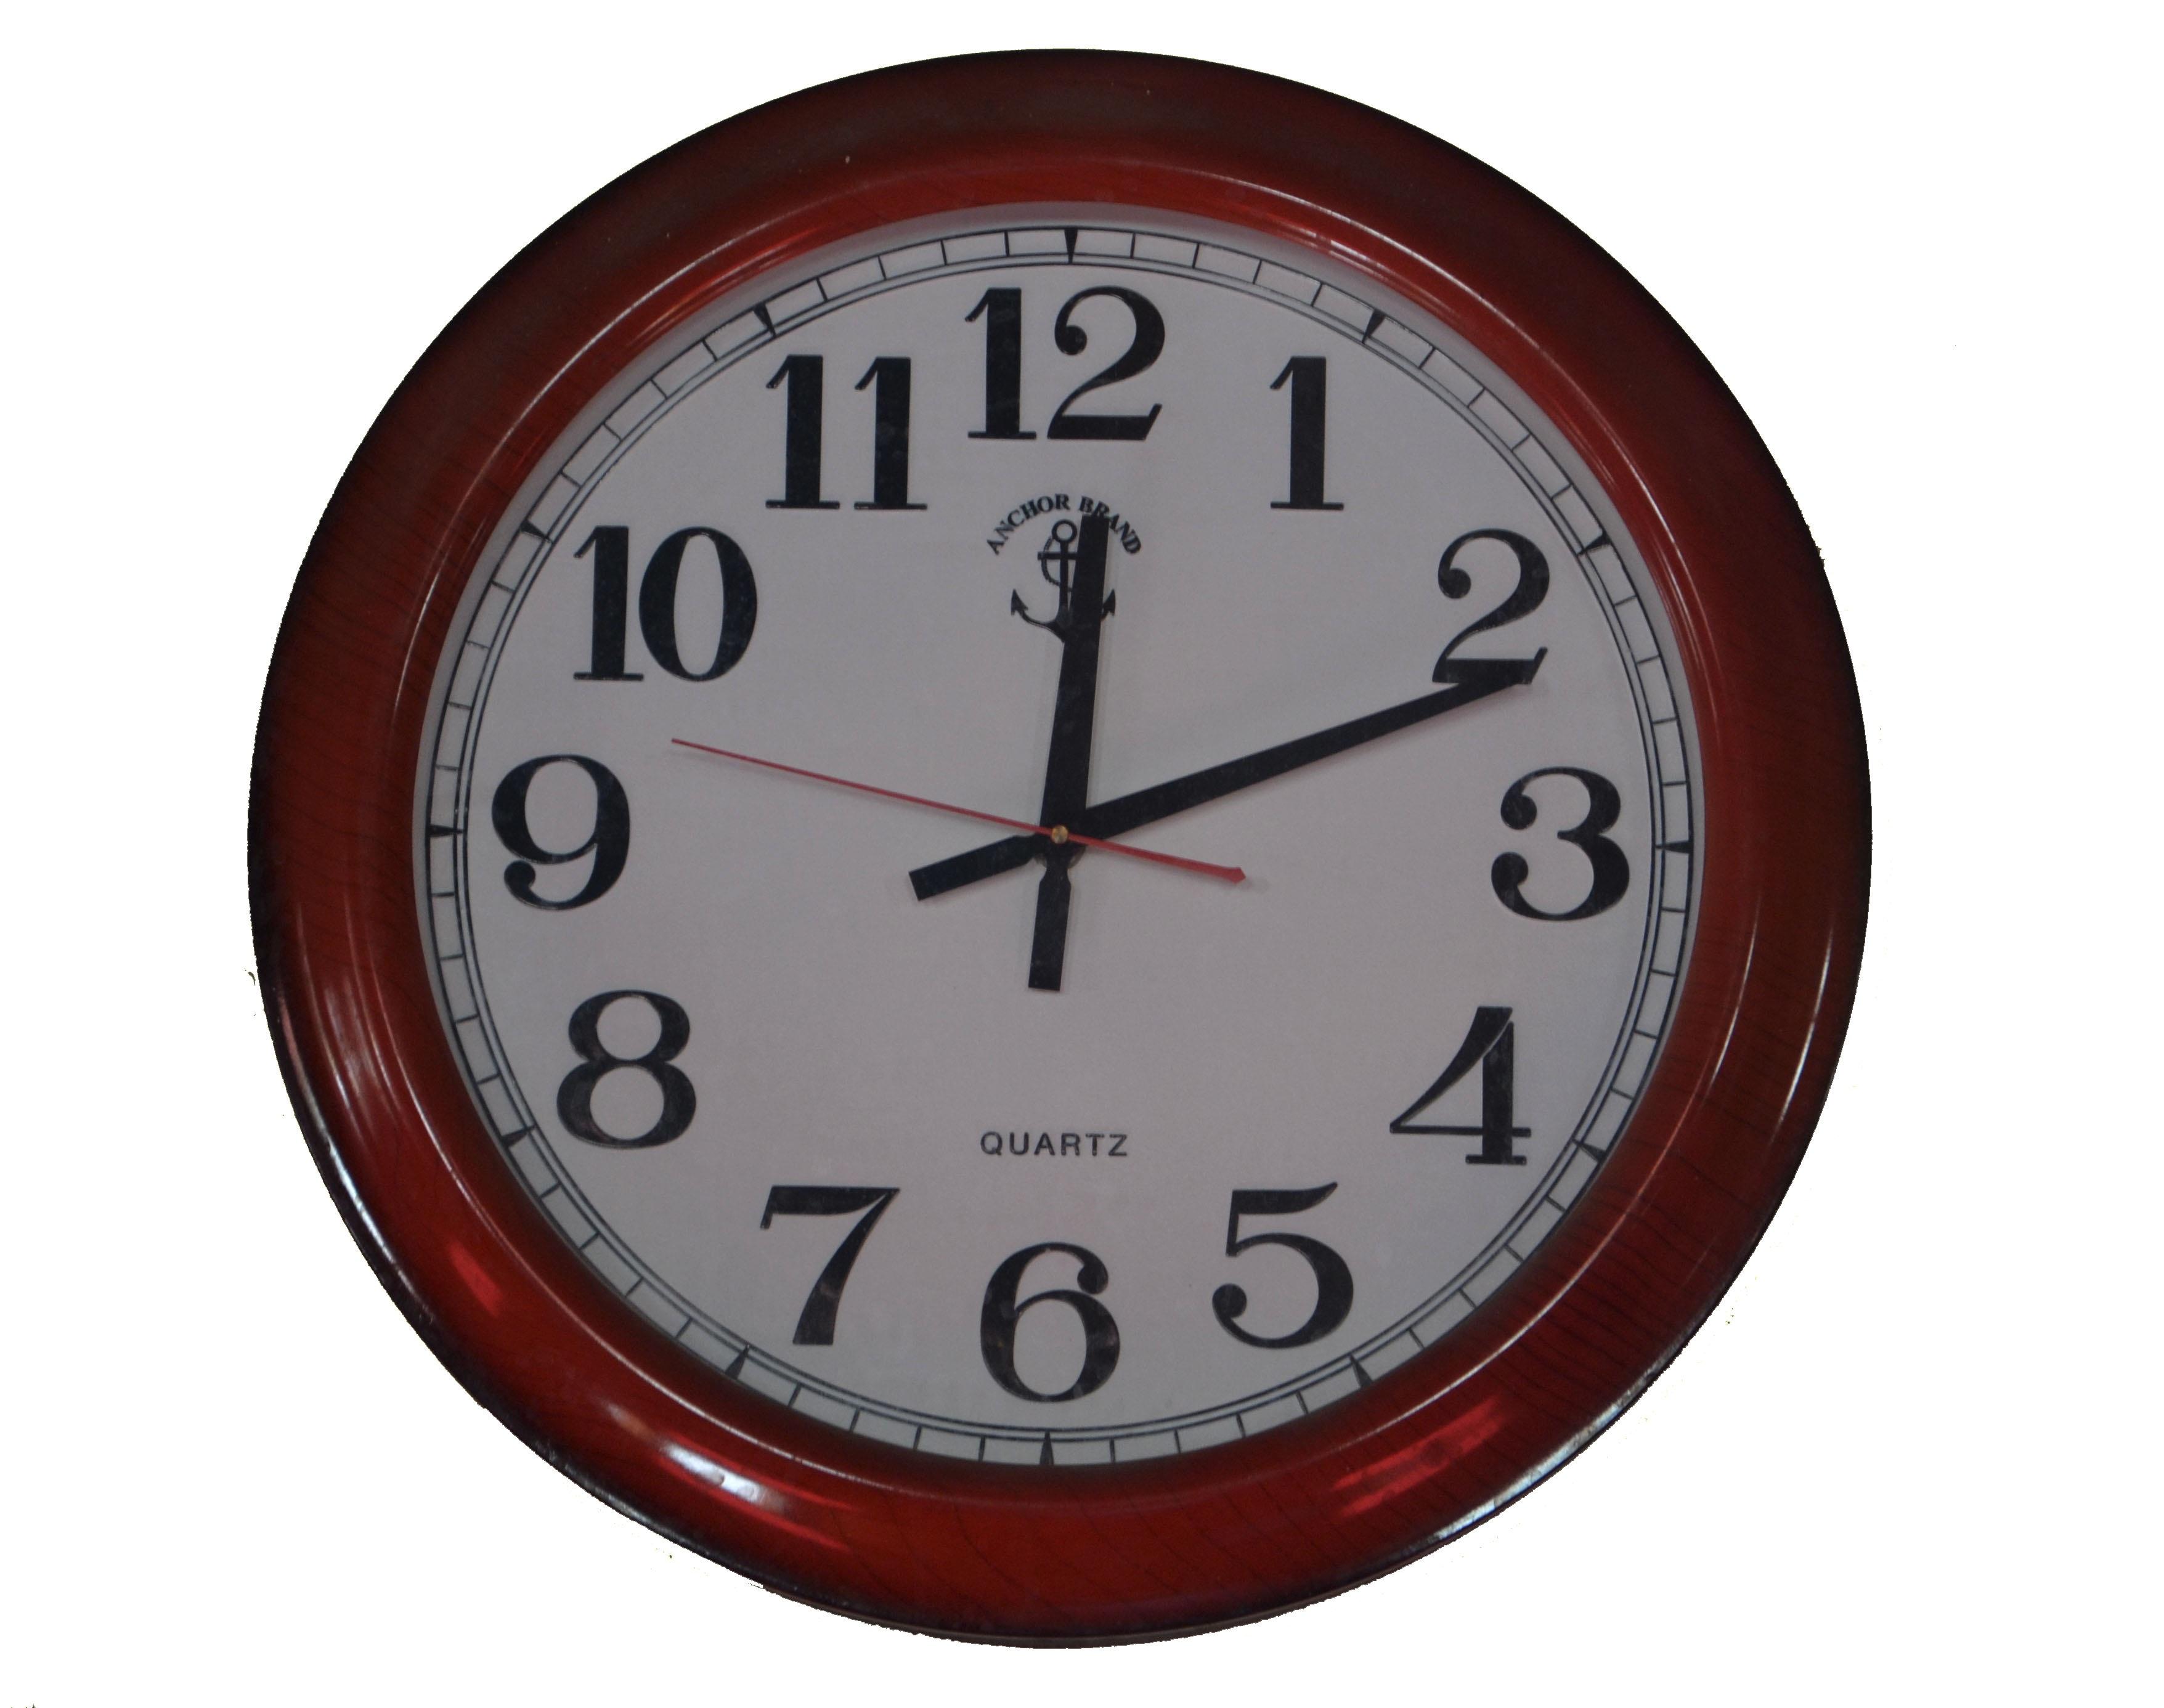 Images Gratuites Regarder Travail Main Retro Rond L Horloge